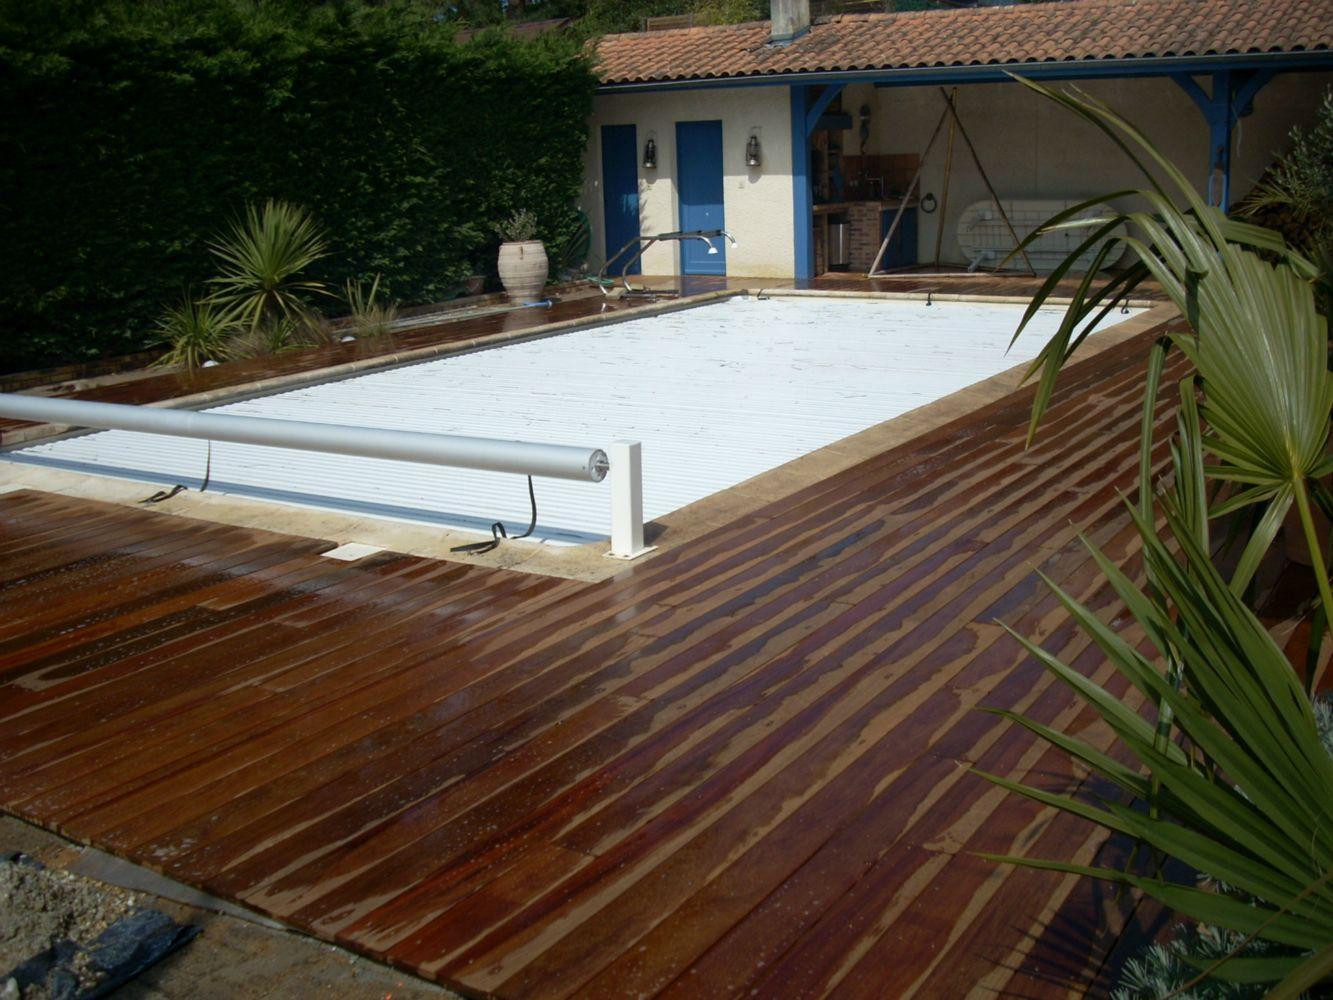 Terrasse en ip autour d 39 une piscine artisan charpente for Terrasse autour d une piscine